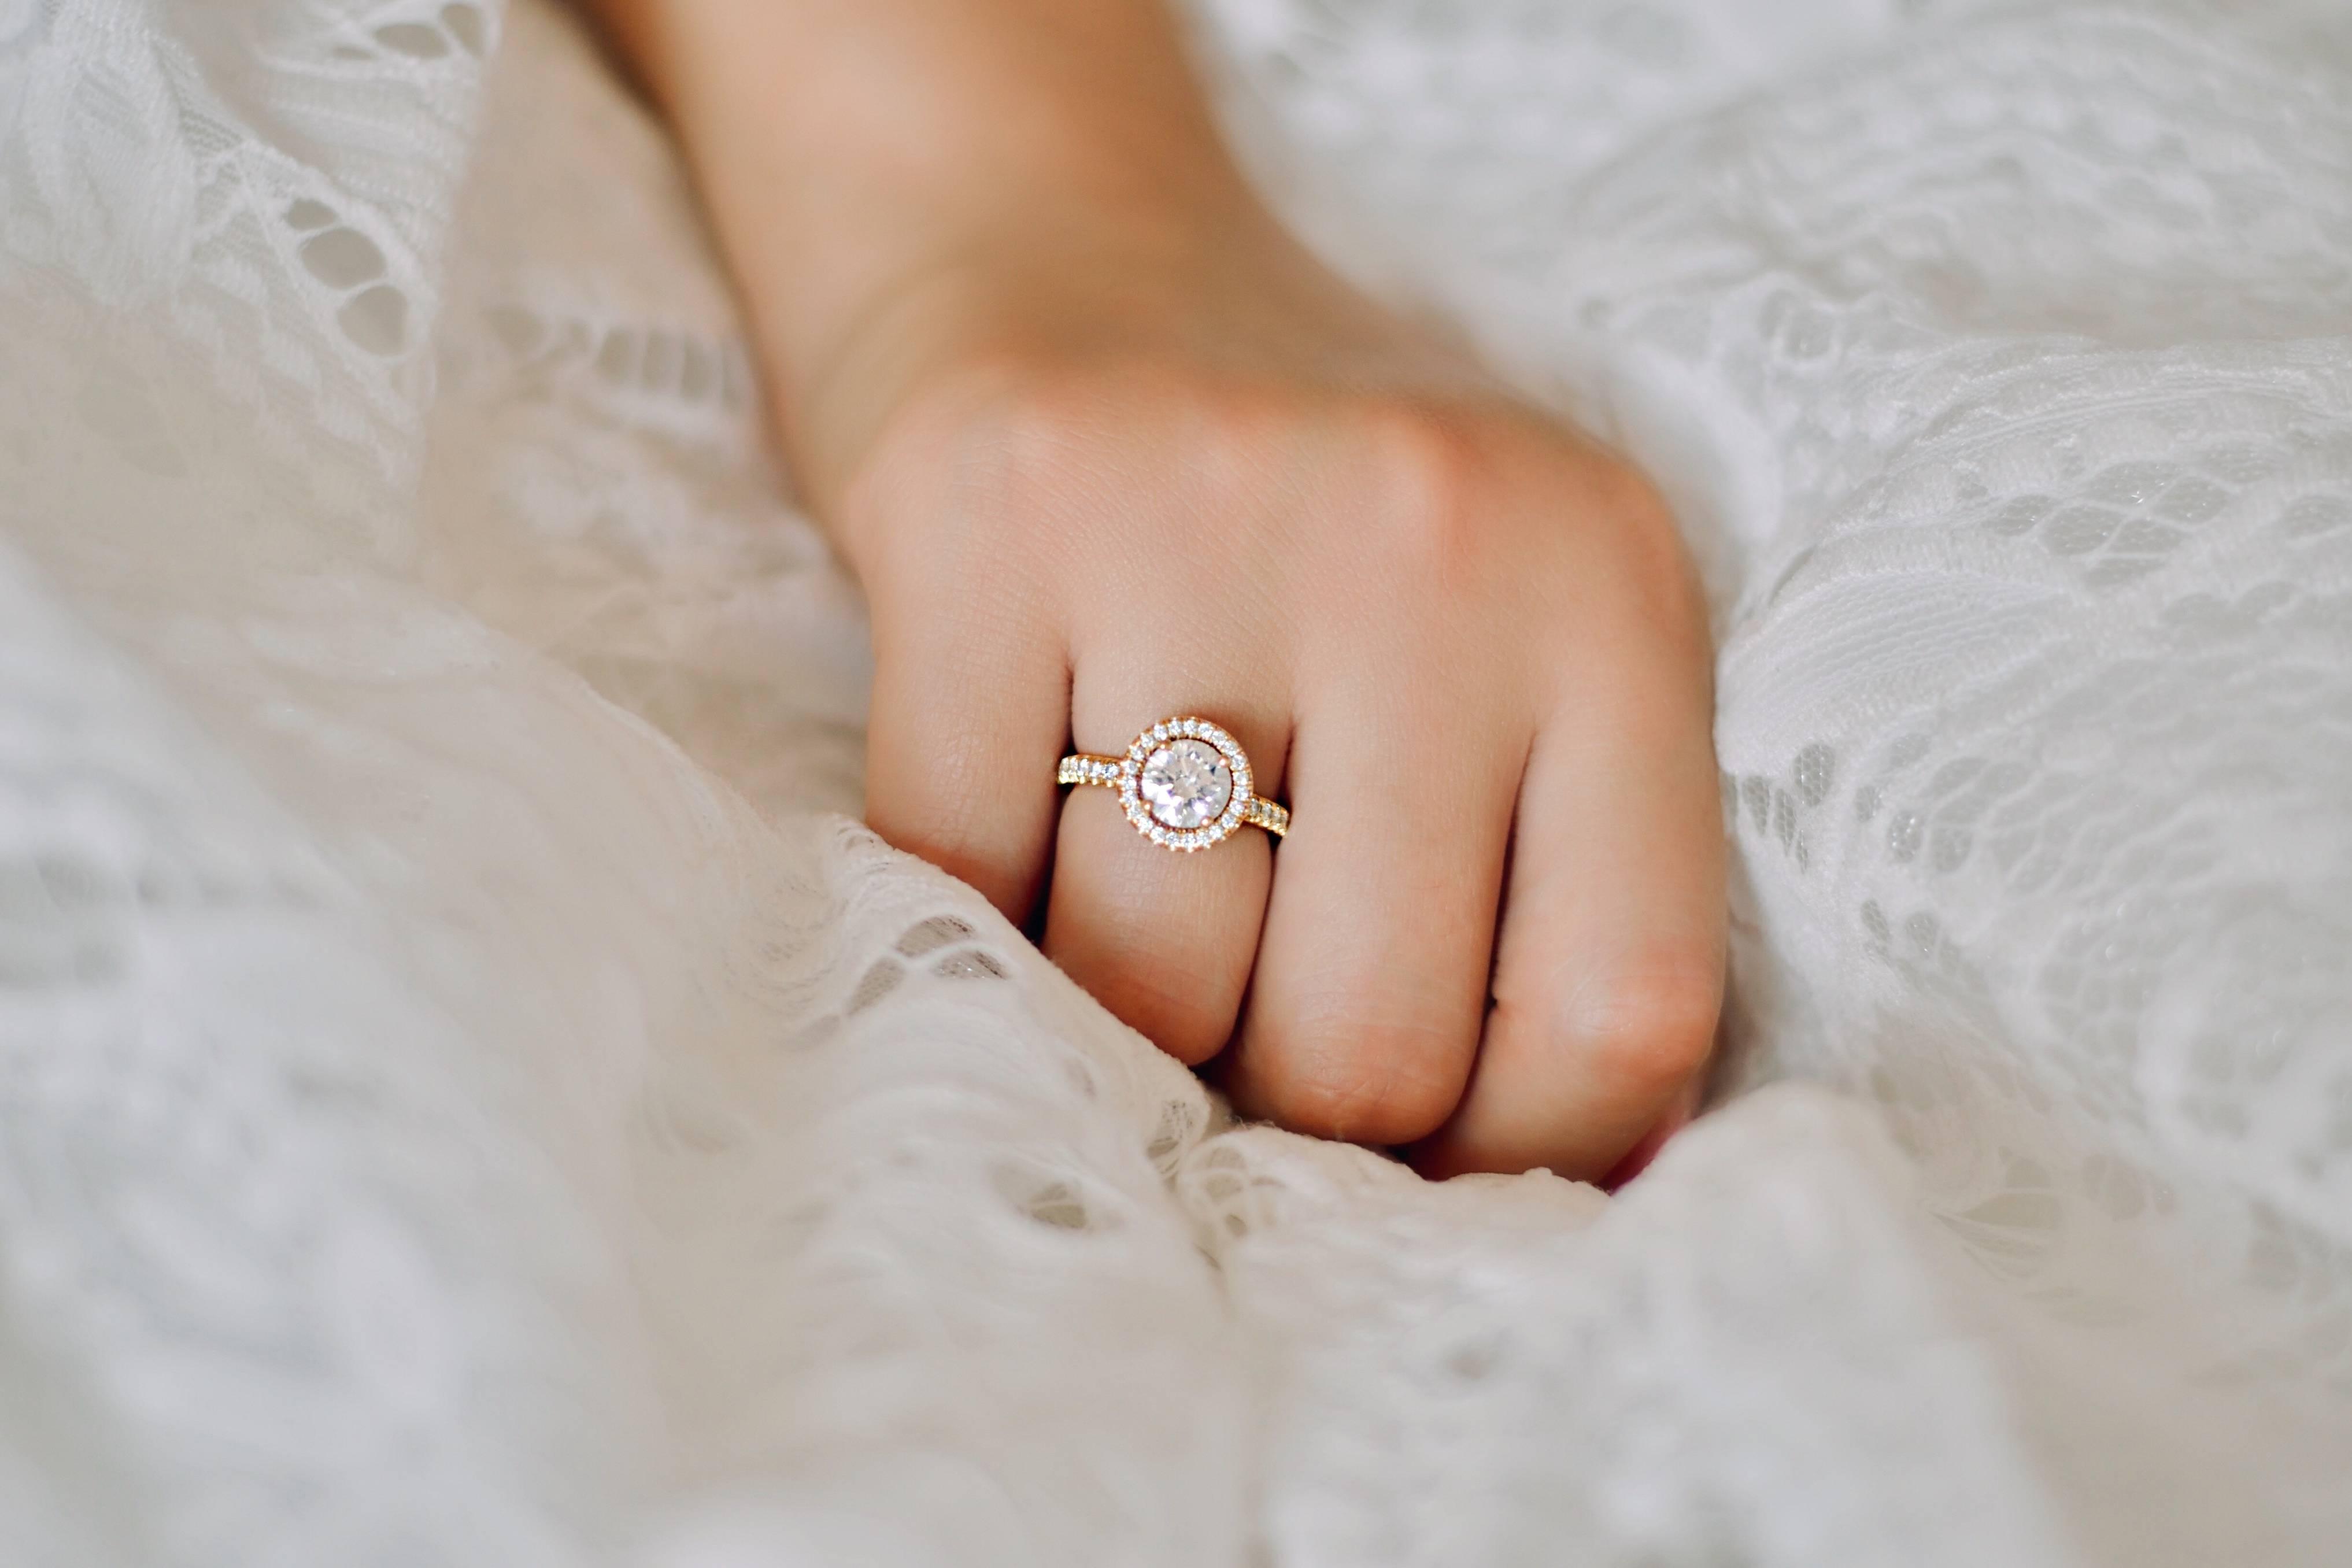 Verlobungsring, Diamanten, Schmuck, Echtschmuck, handgefertigt, Baunat